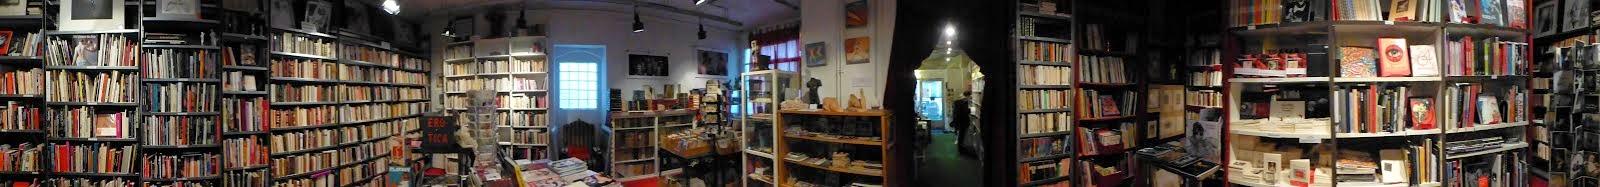 Panorama de la librairie